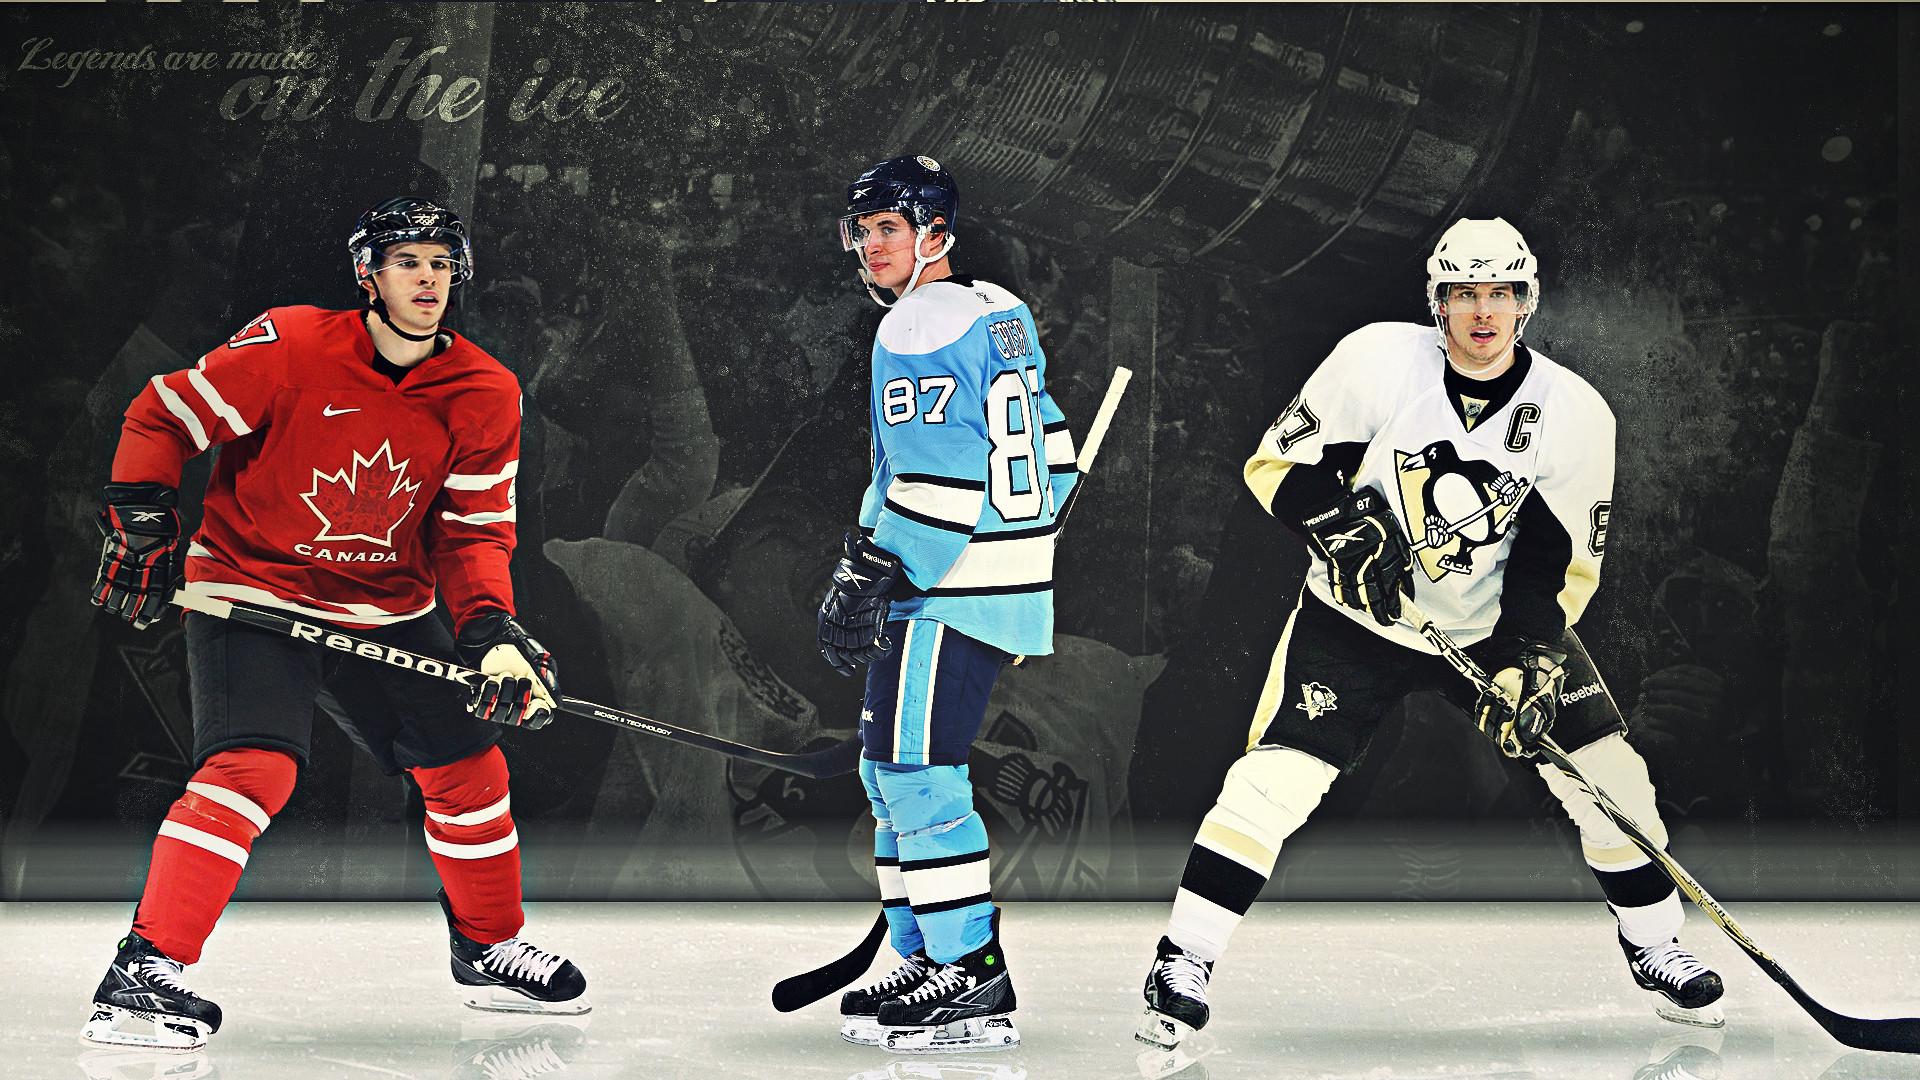 Sidney Crosby Wallpaper 5